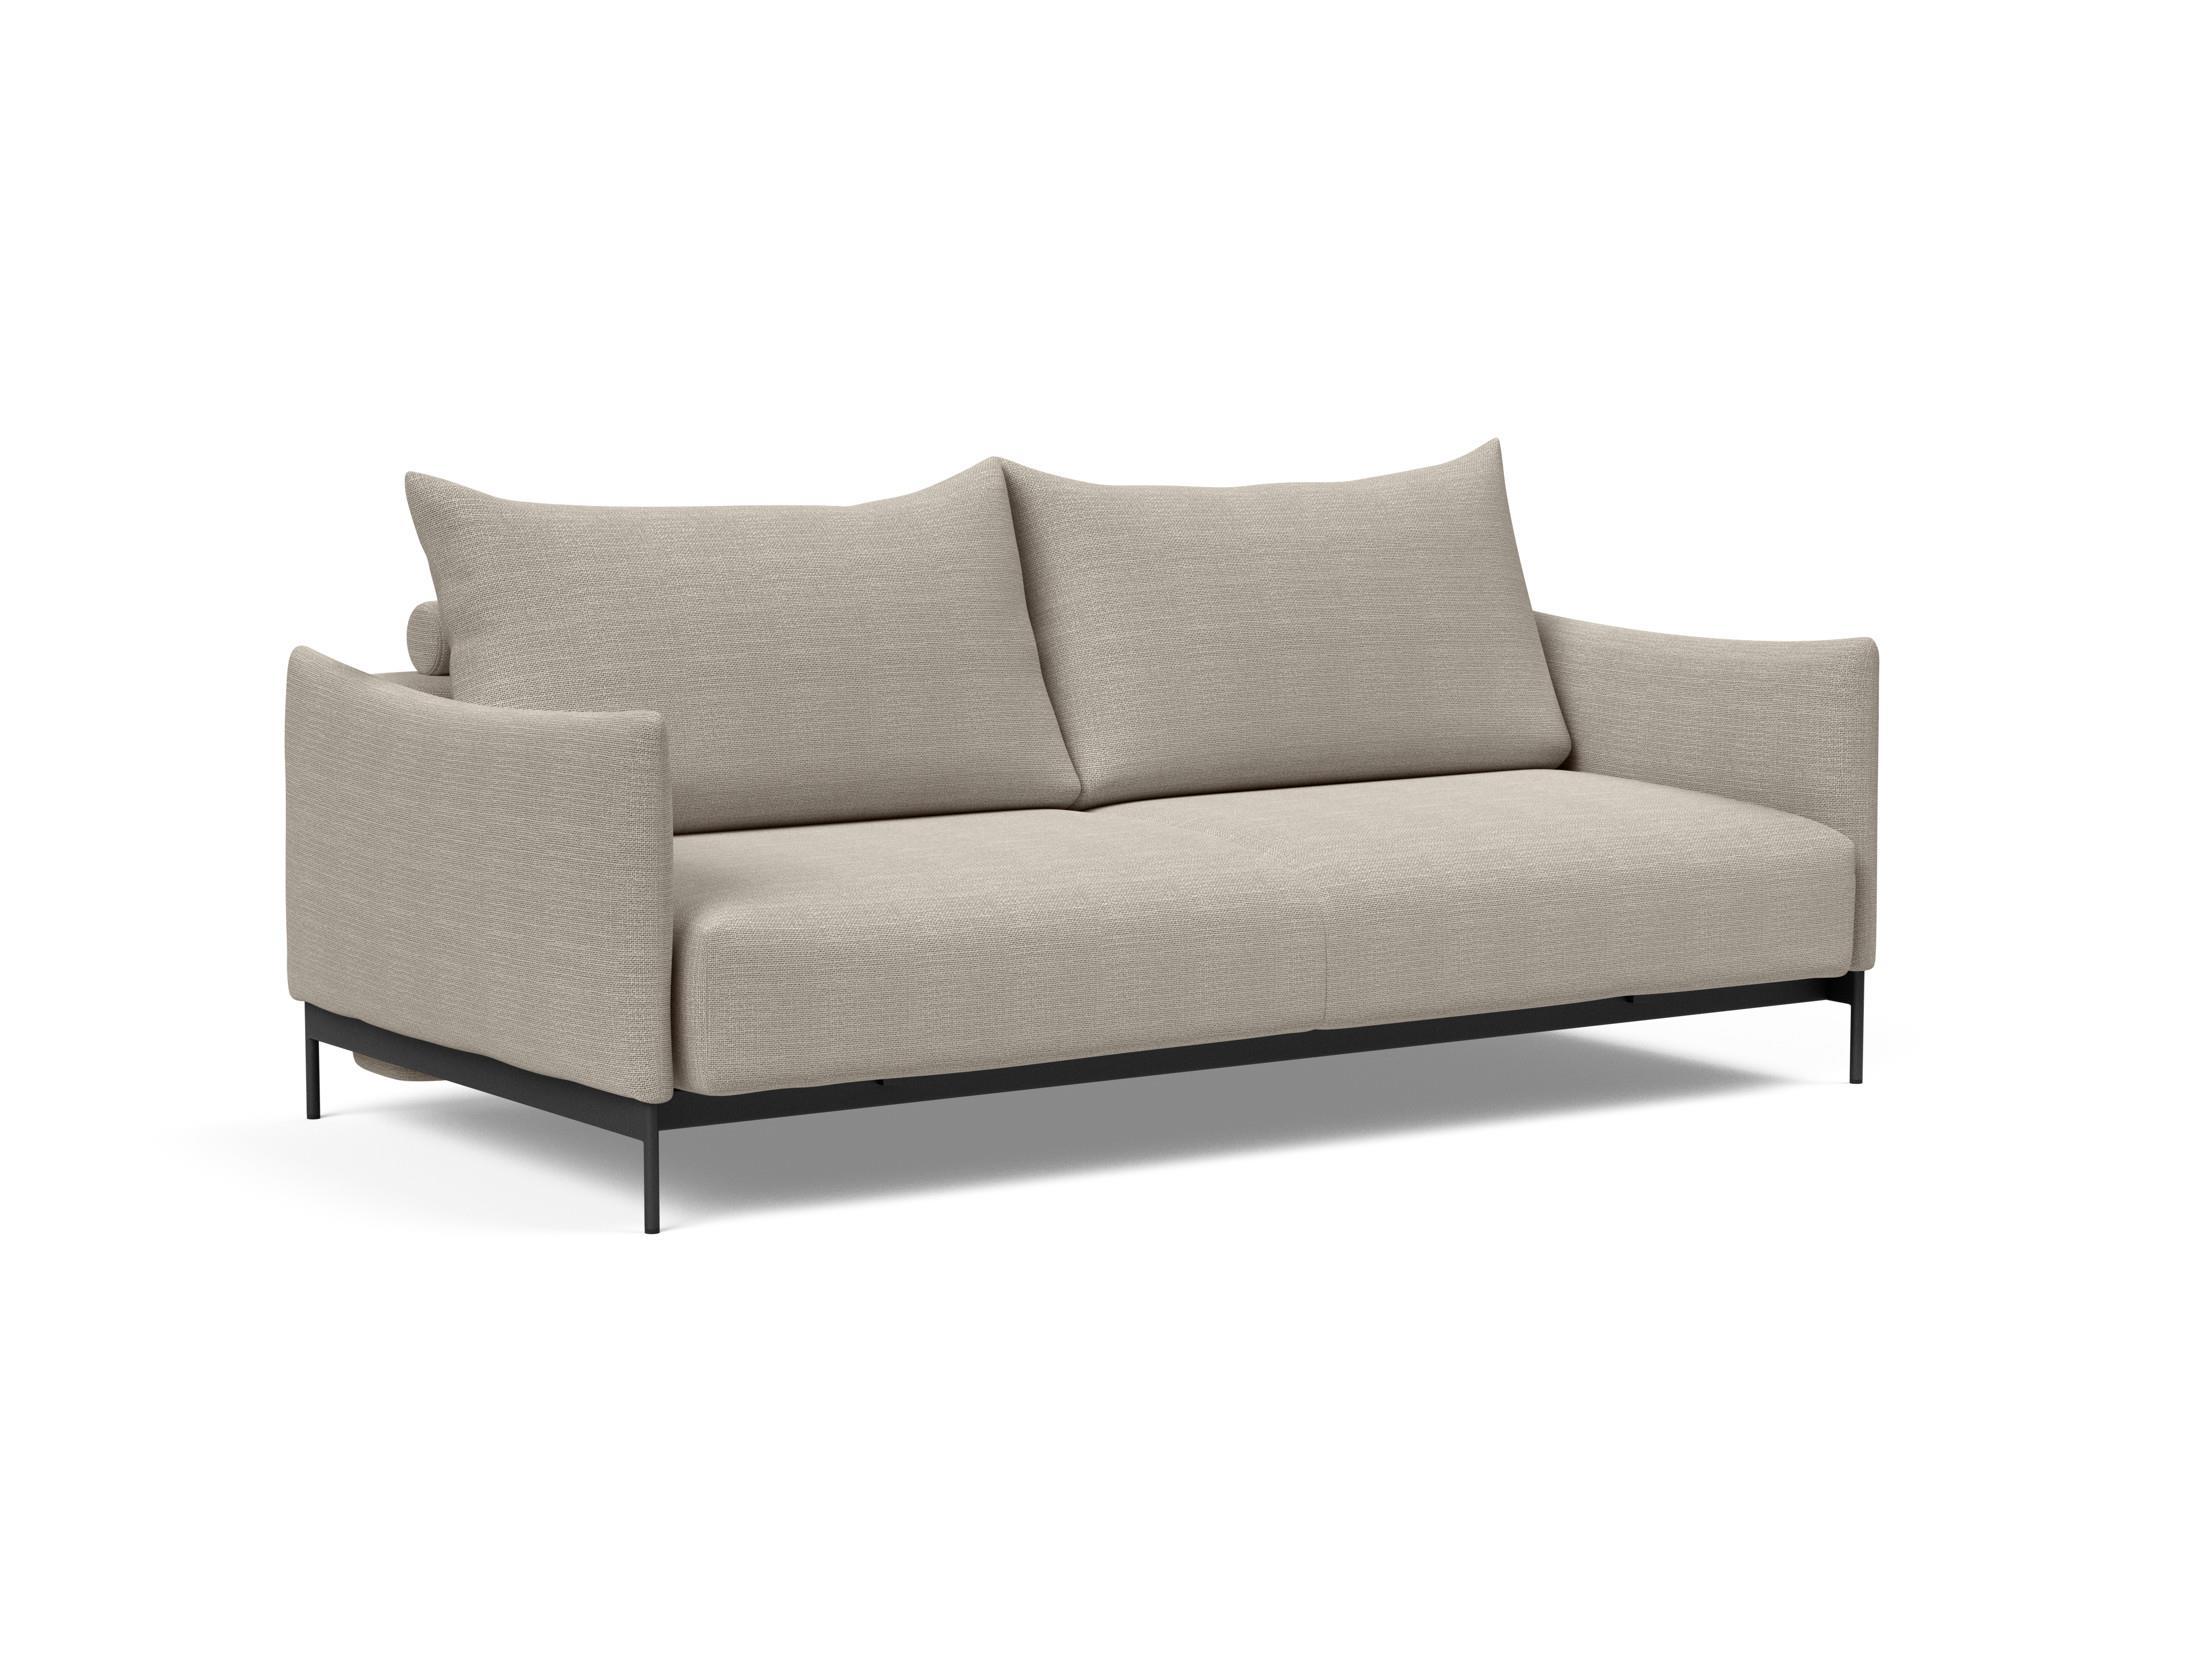 media/image/Malloy-Sofa-Bed-579-p2-webwgCdDW4vR6ooL.jpg